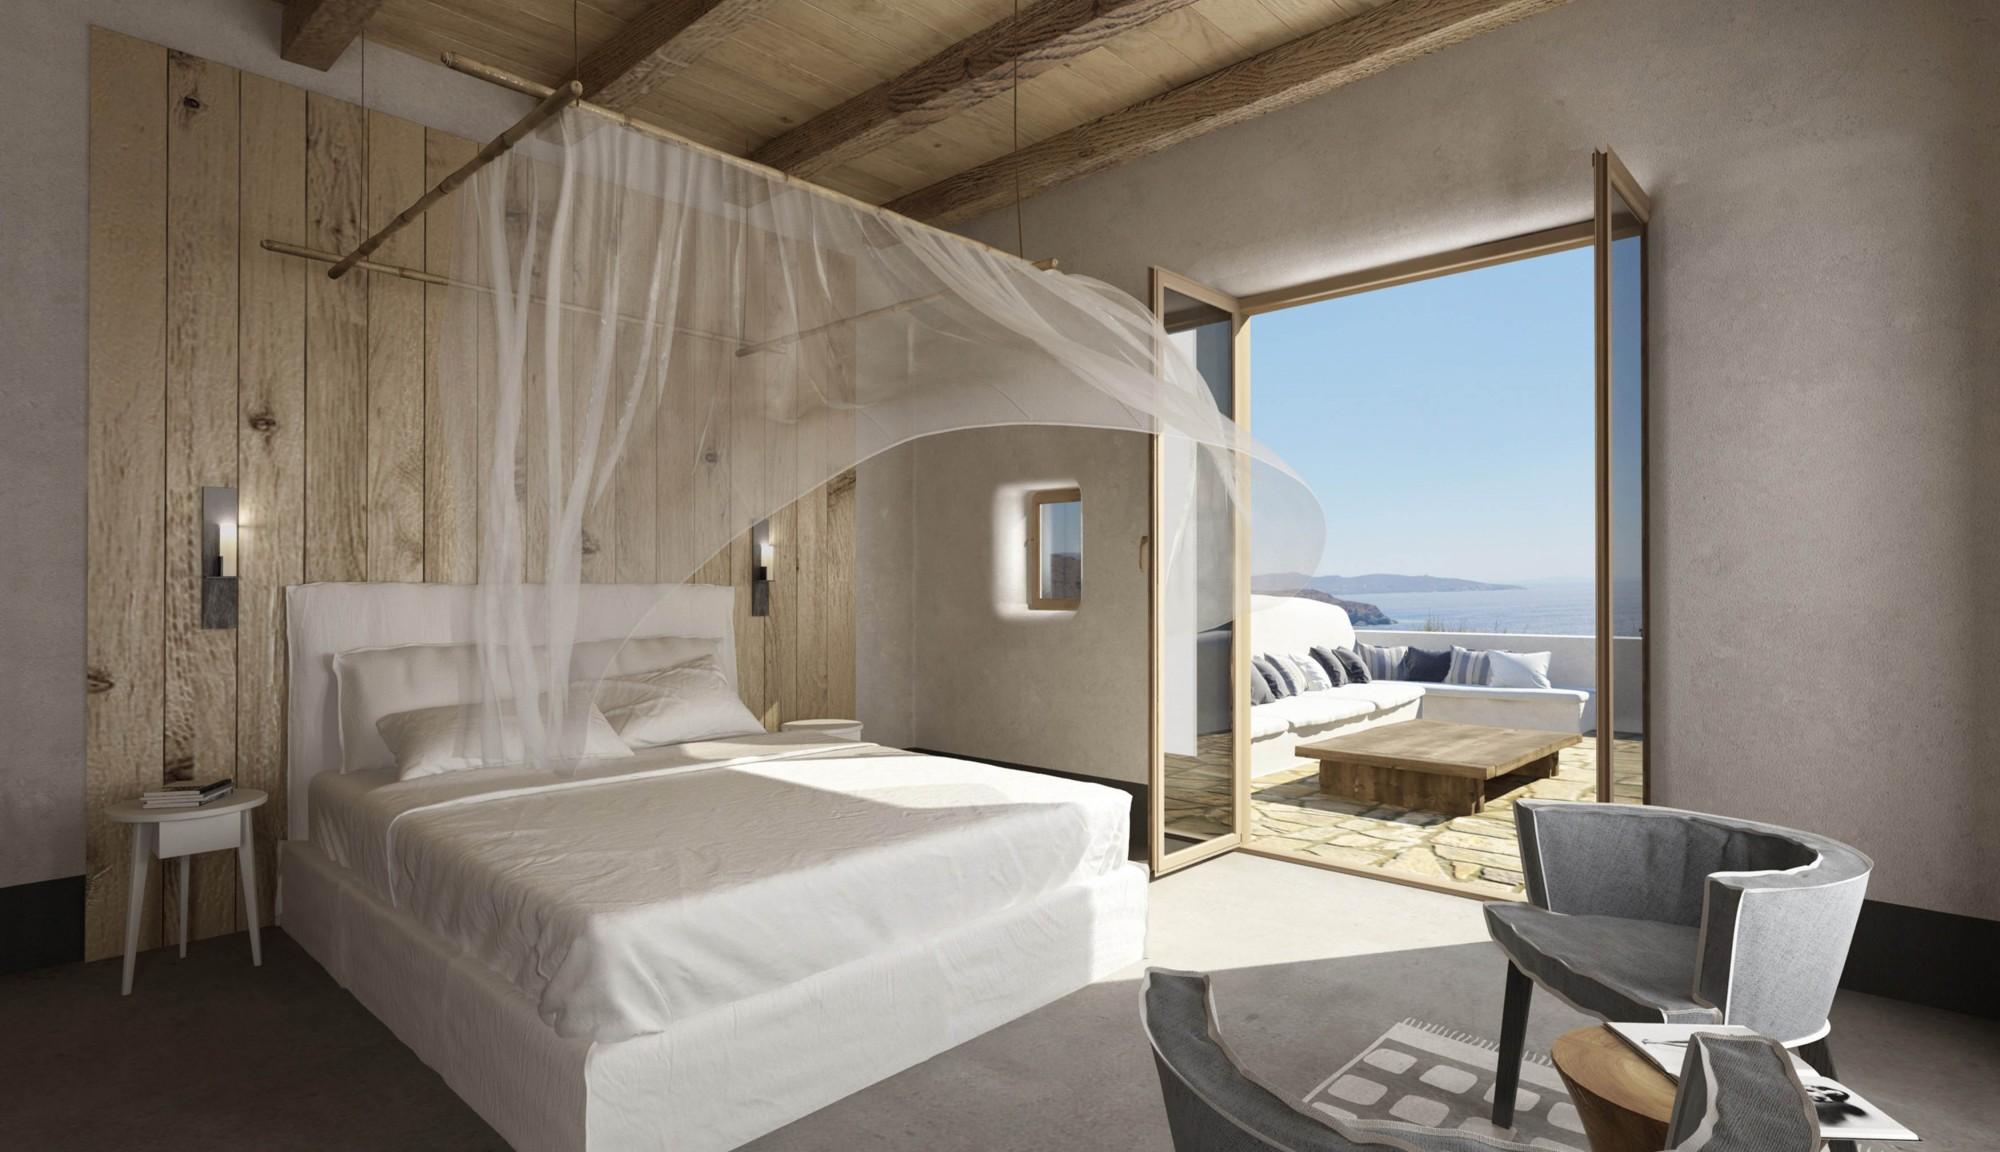 ventes a vendre en gr u00e8ce  superbe villa face  u00e0 la mer avec 6 chambres piscine etc